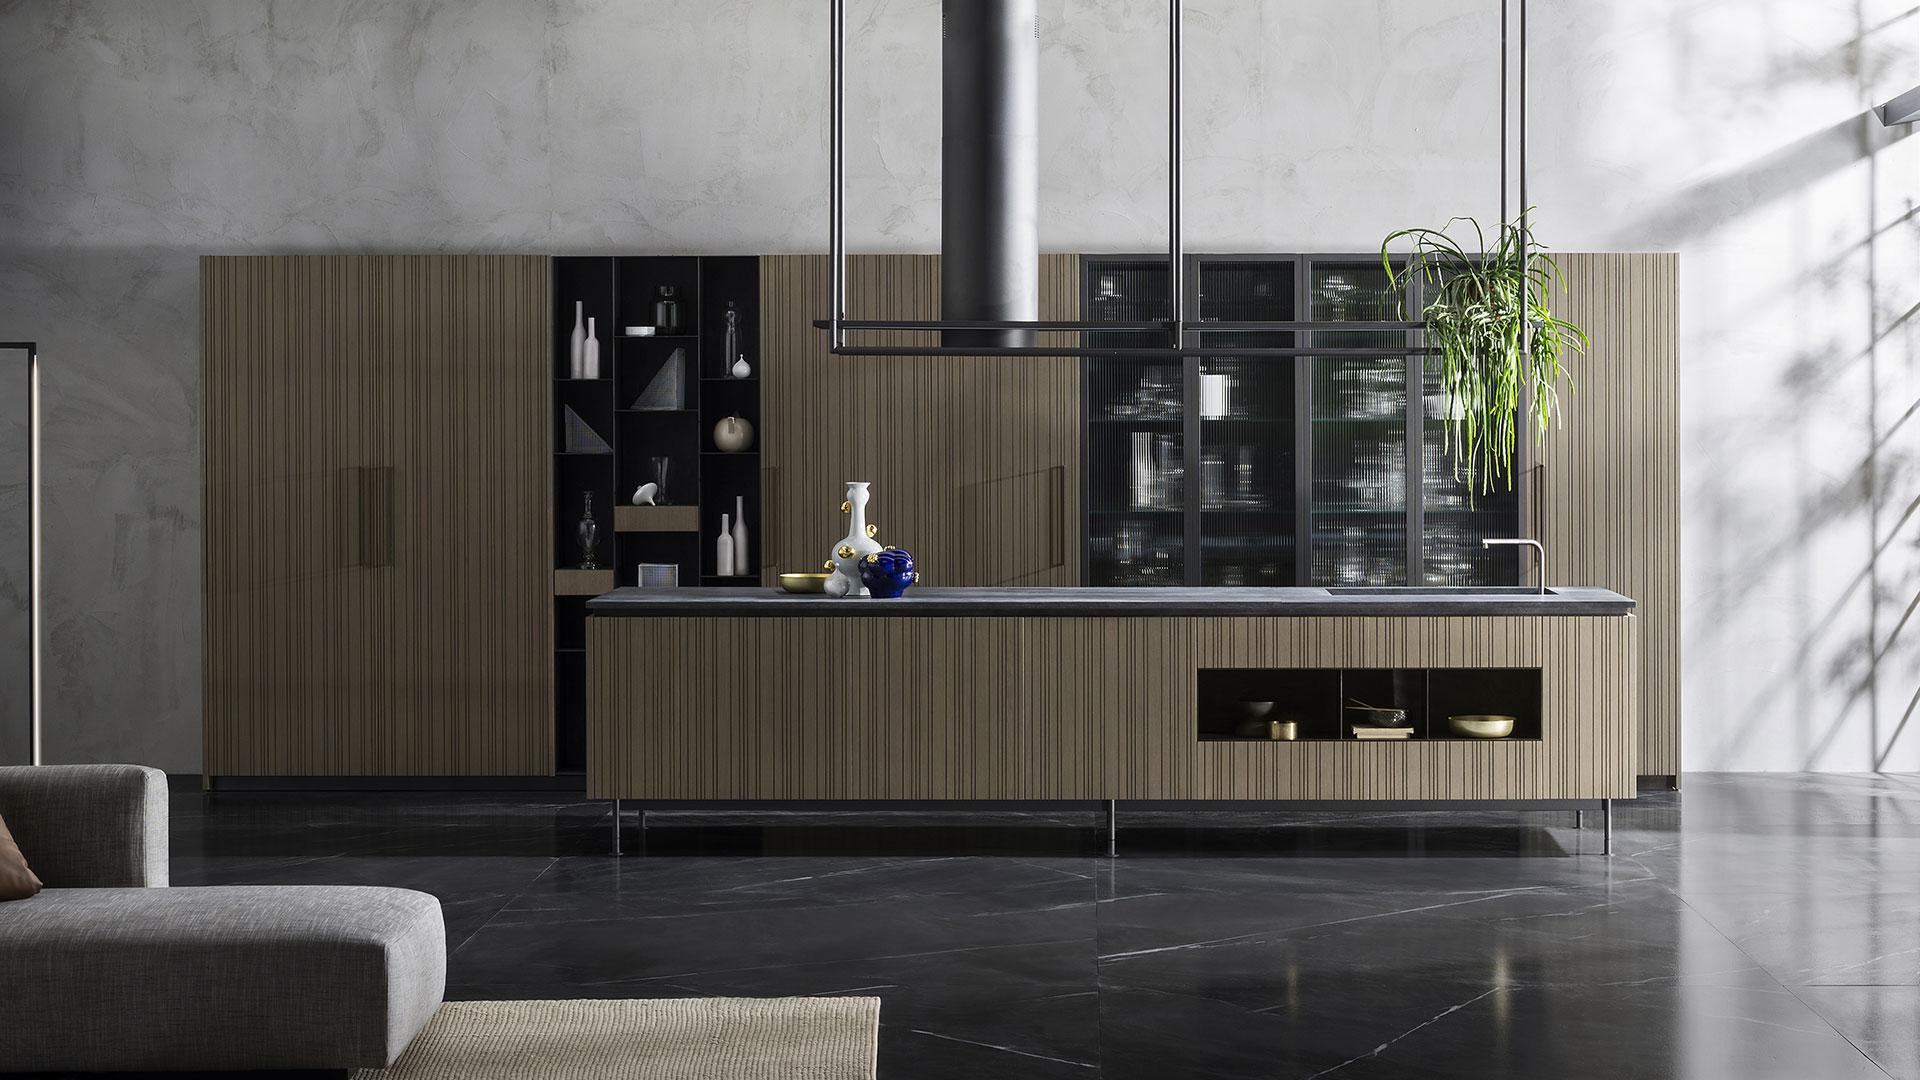 Design kitchen, wood kitchen - Collection RUA - TM_MI2018_Rua_001